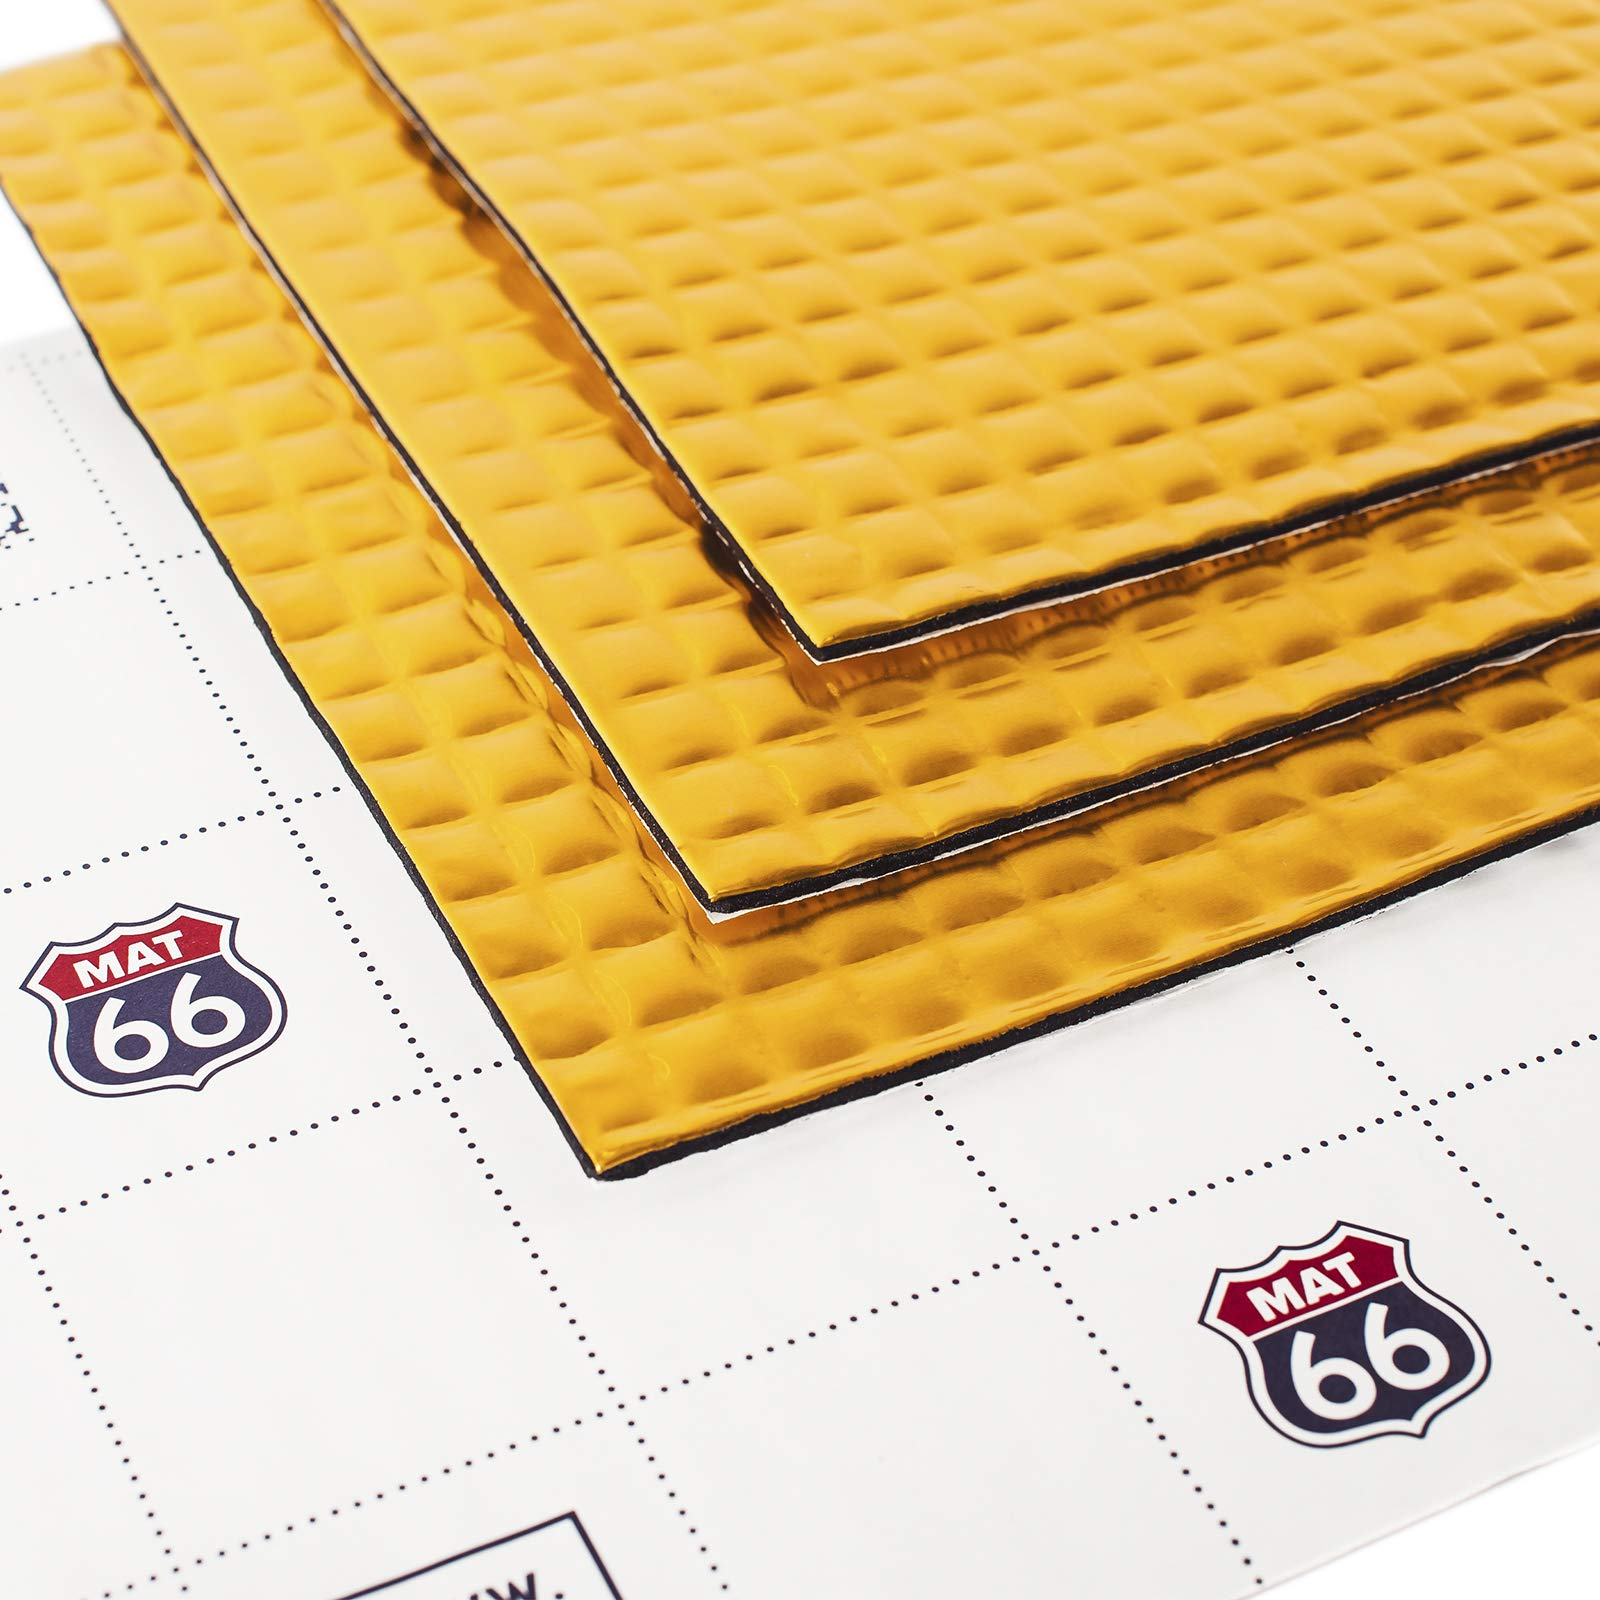 MAT 66 120 mil 23 sqft Car Sound Deadening mat, Butyl Automotive Sound Deadener, Audio Noise Insulation and dampening by MAT 66